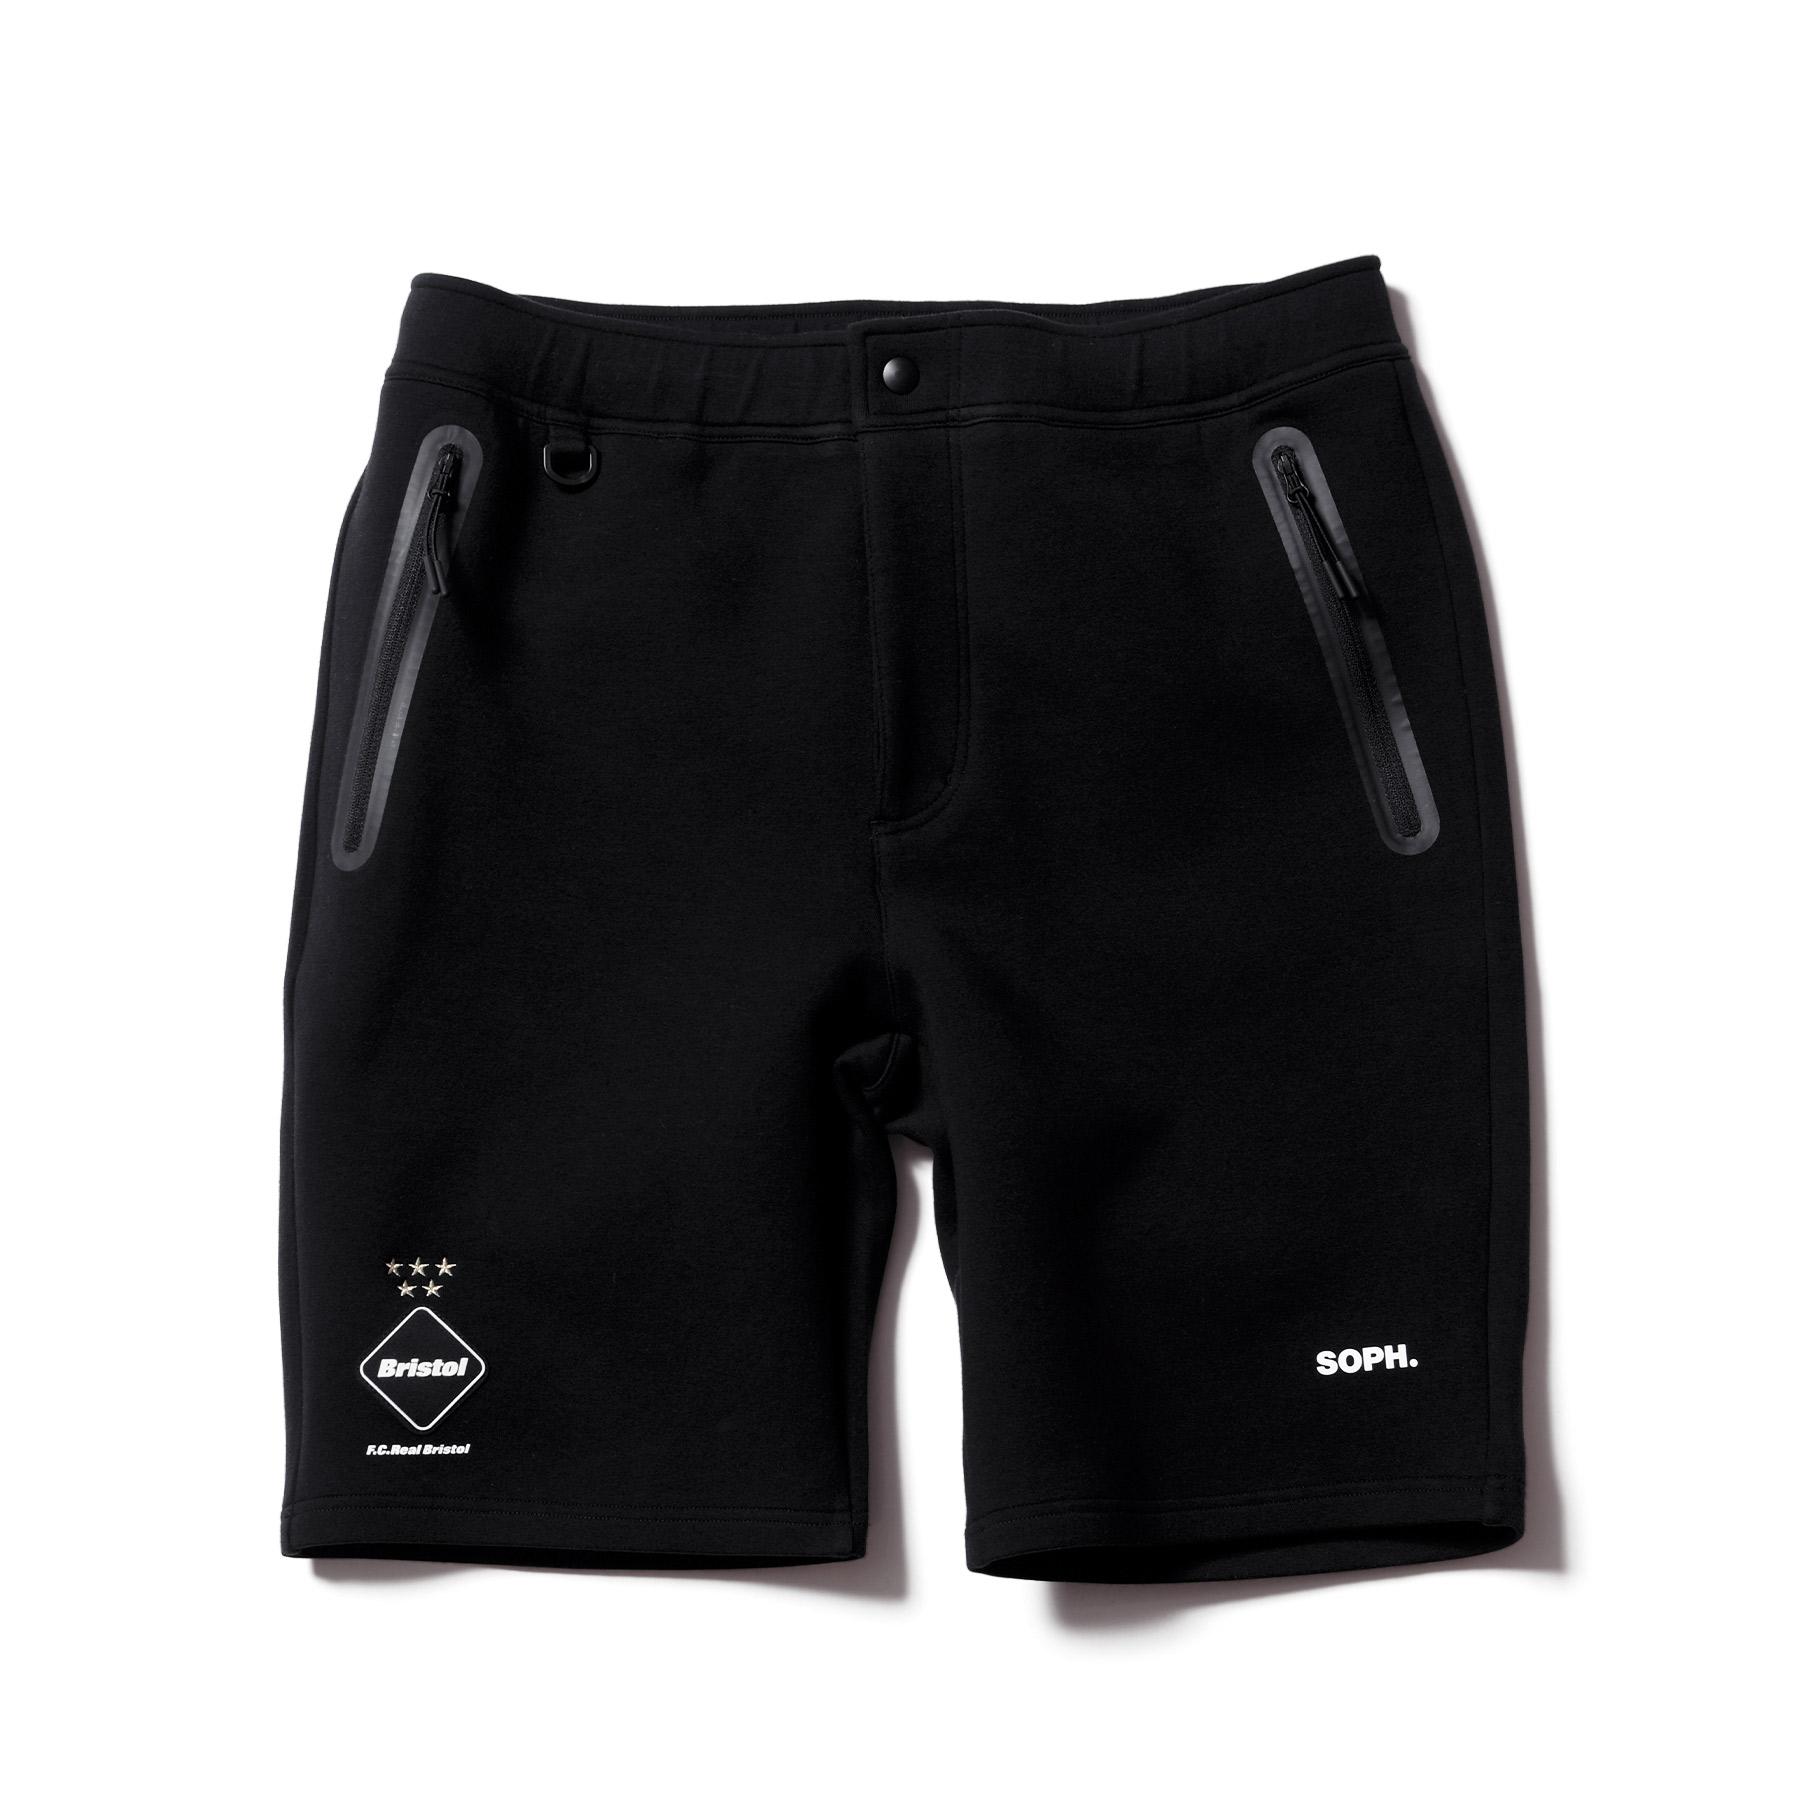 F.C.Real Bristol / SWEAT TRAINING SHORTS (Black)